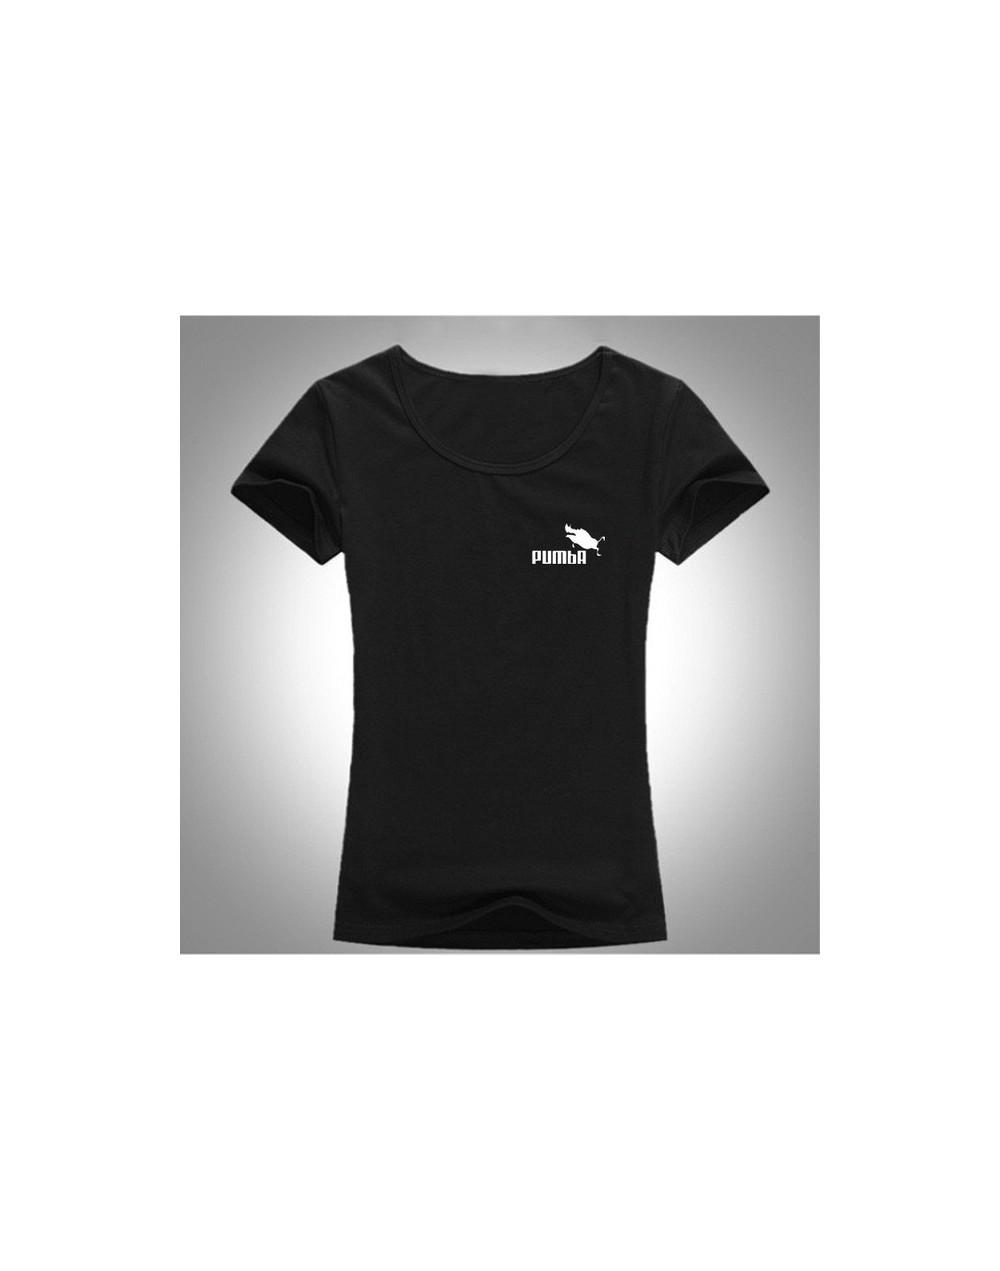 2019 New Summer T Shirts Womens Tshirts Female girl Tops Tees T-Shirt pumba Slim womans Short sleeve Plus Size M 3XL pum4018...